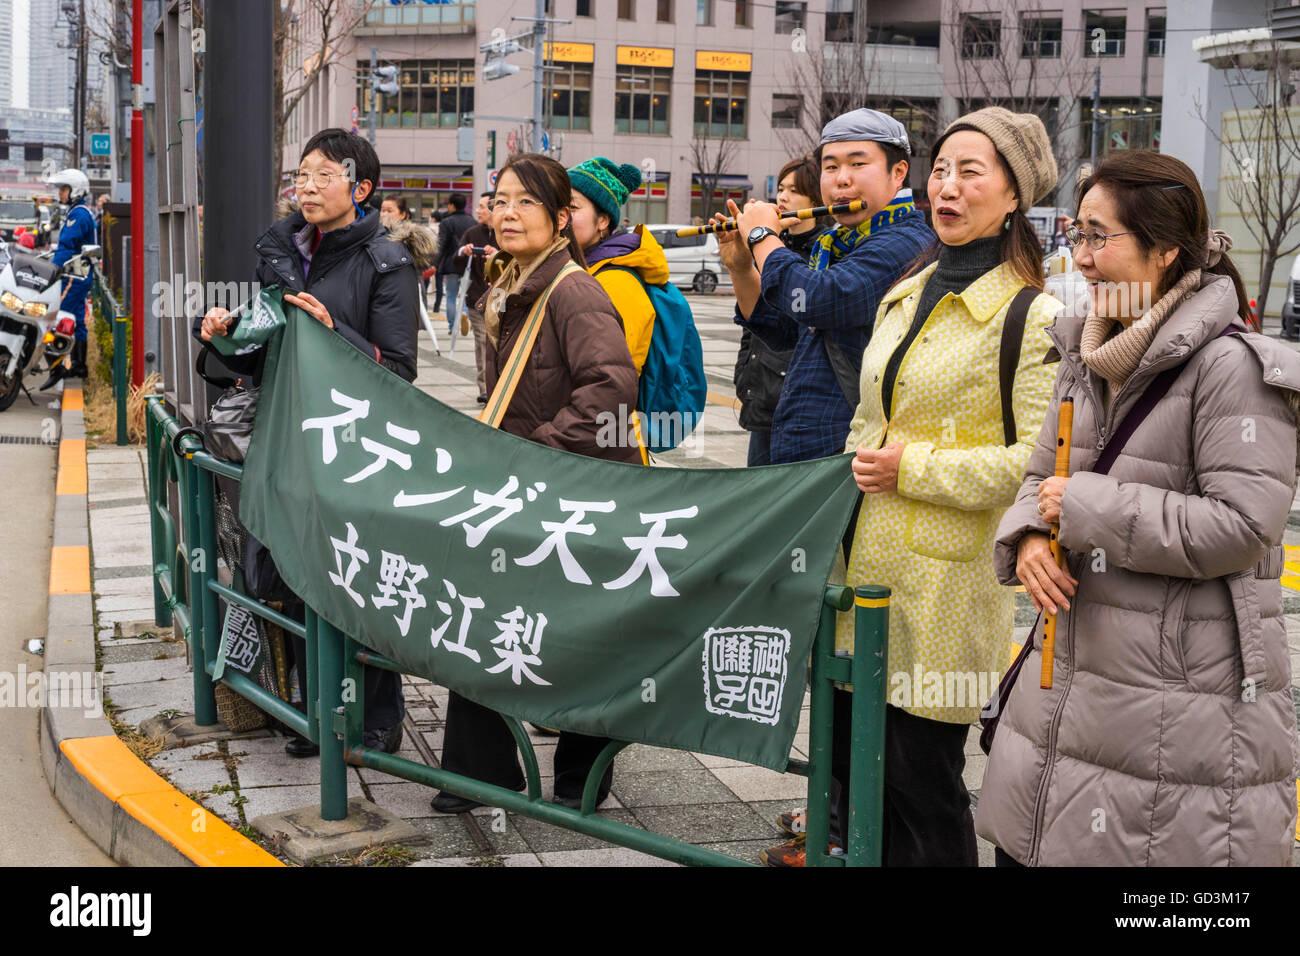 I cittadini giapponesi tifo marathon, Tokyo, Giappone Immagini Stock